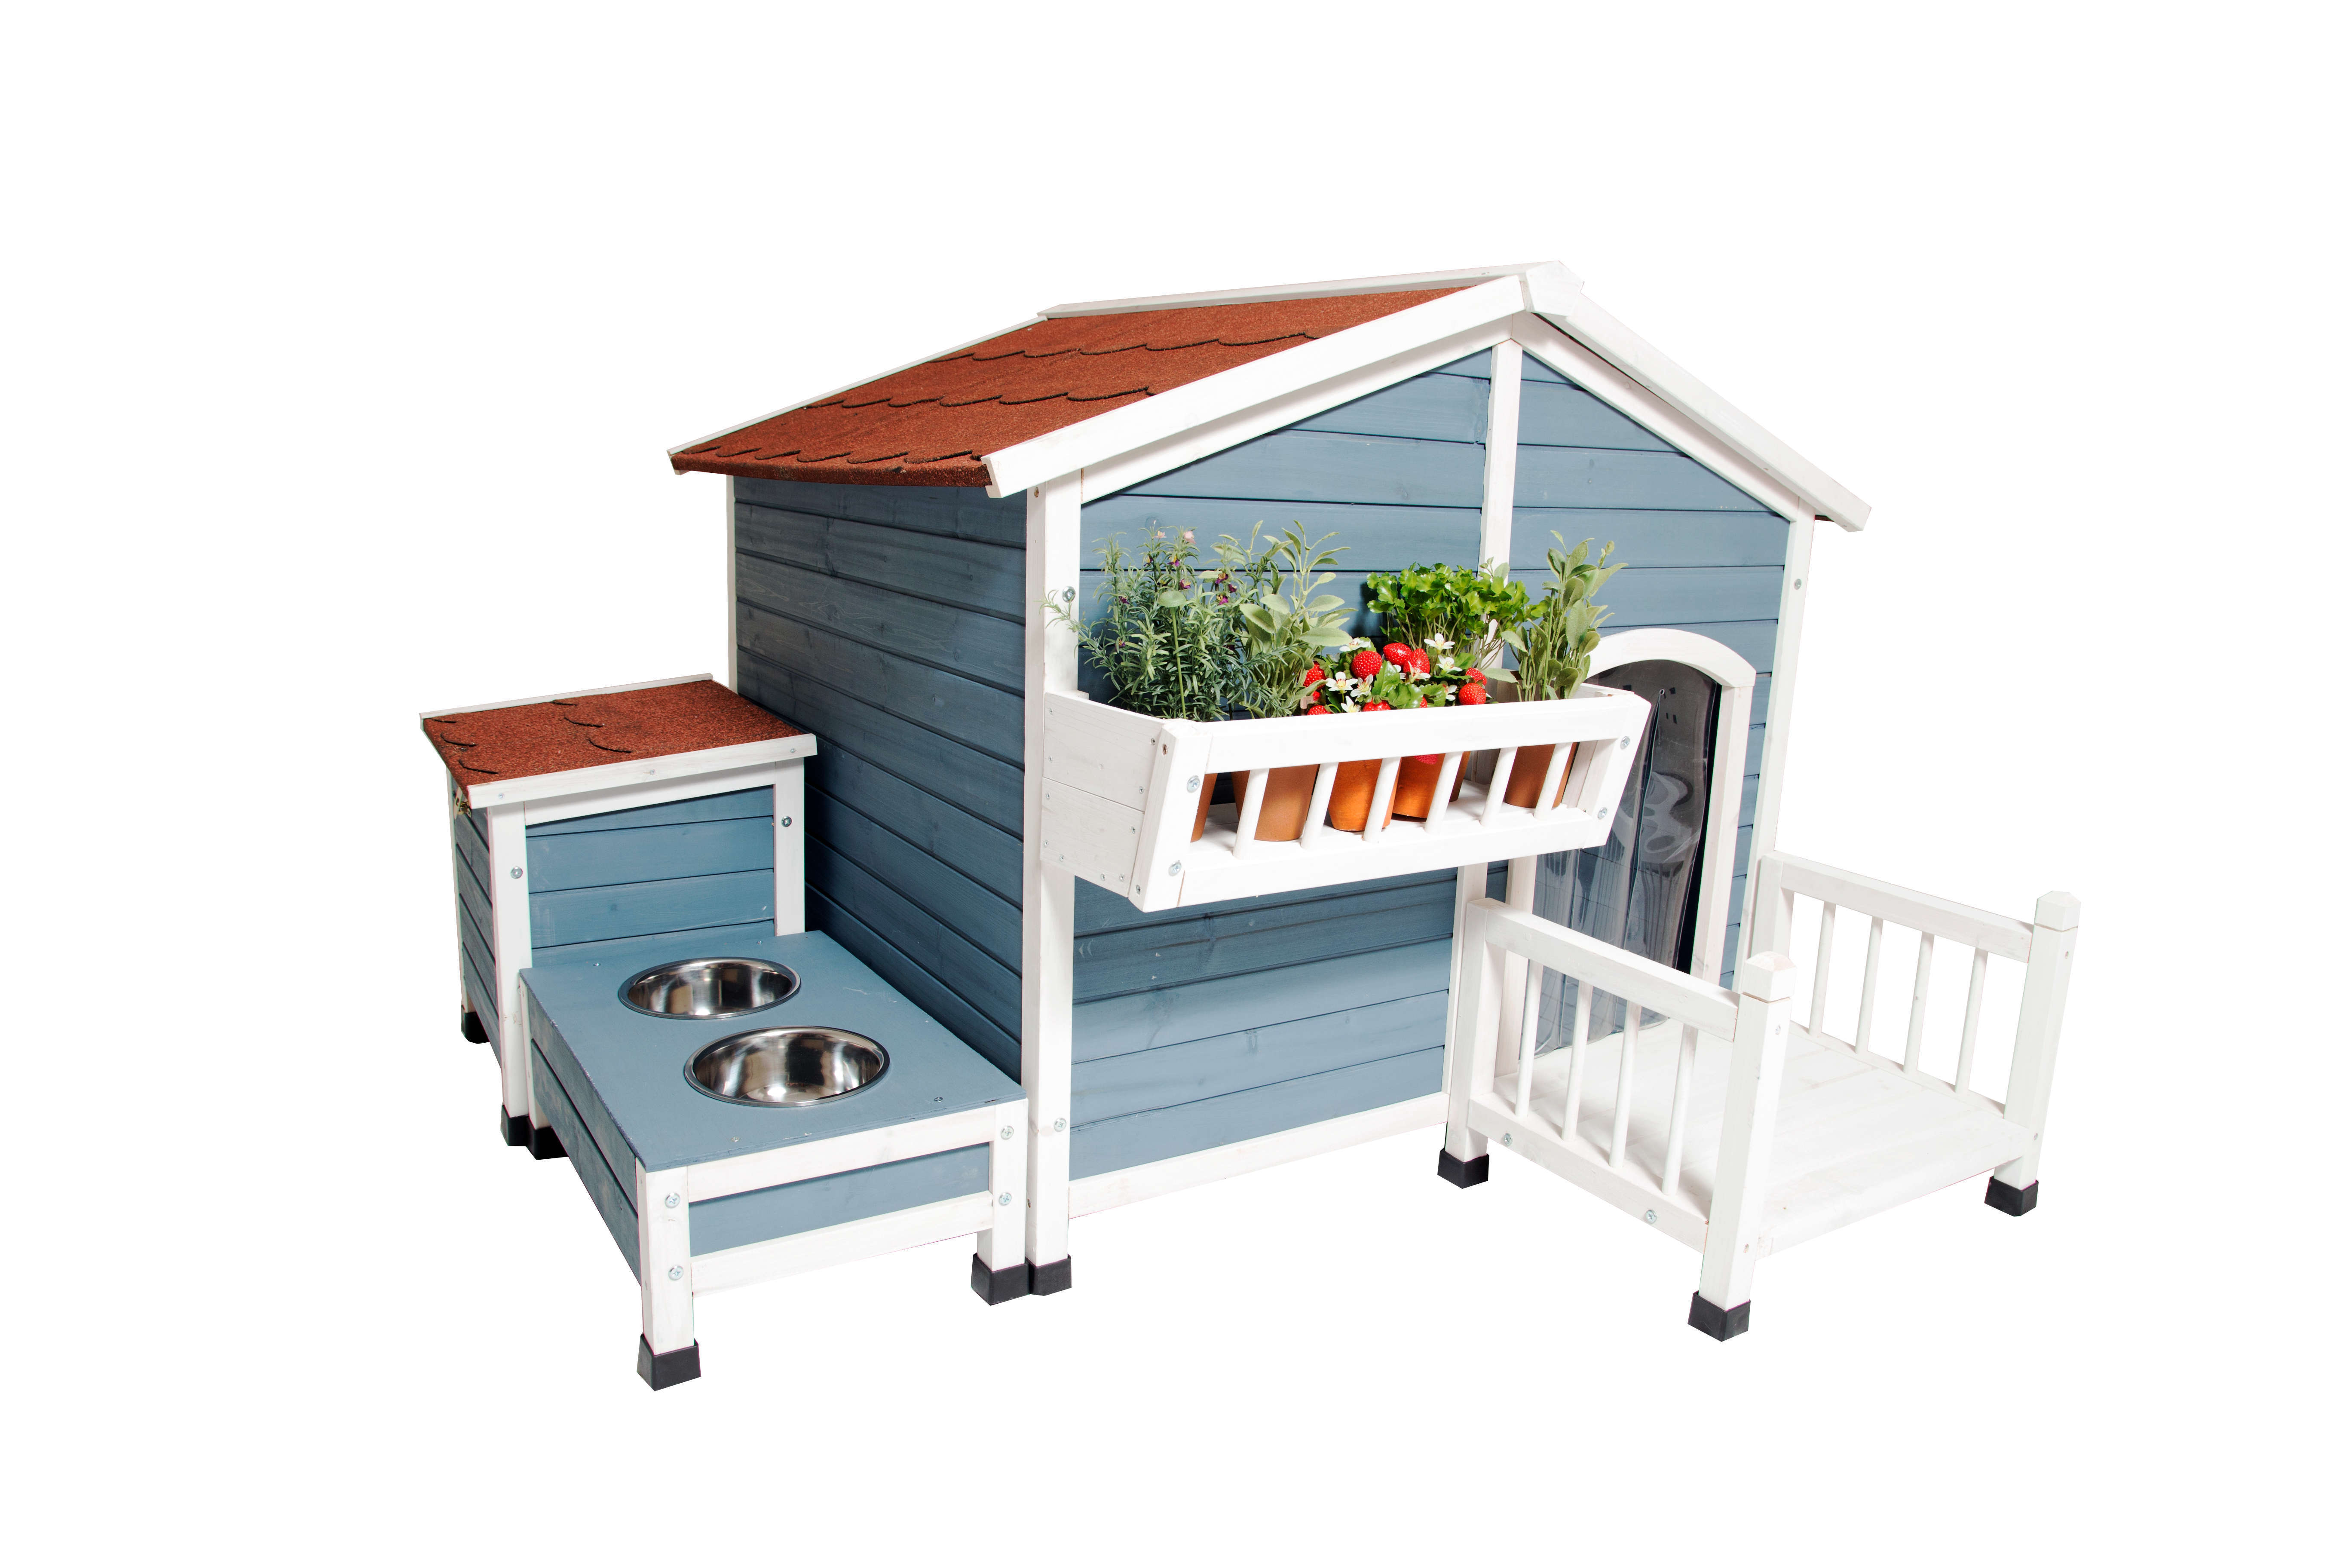 The Garden Cottage Dog House